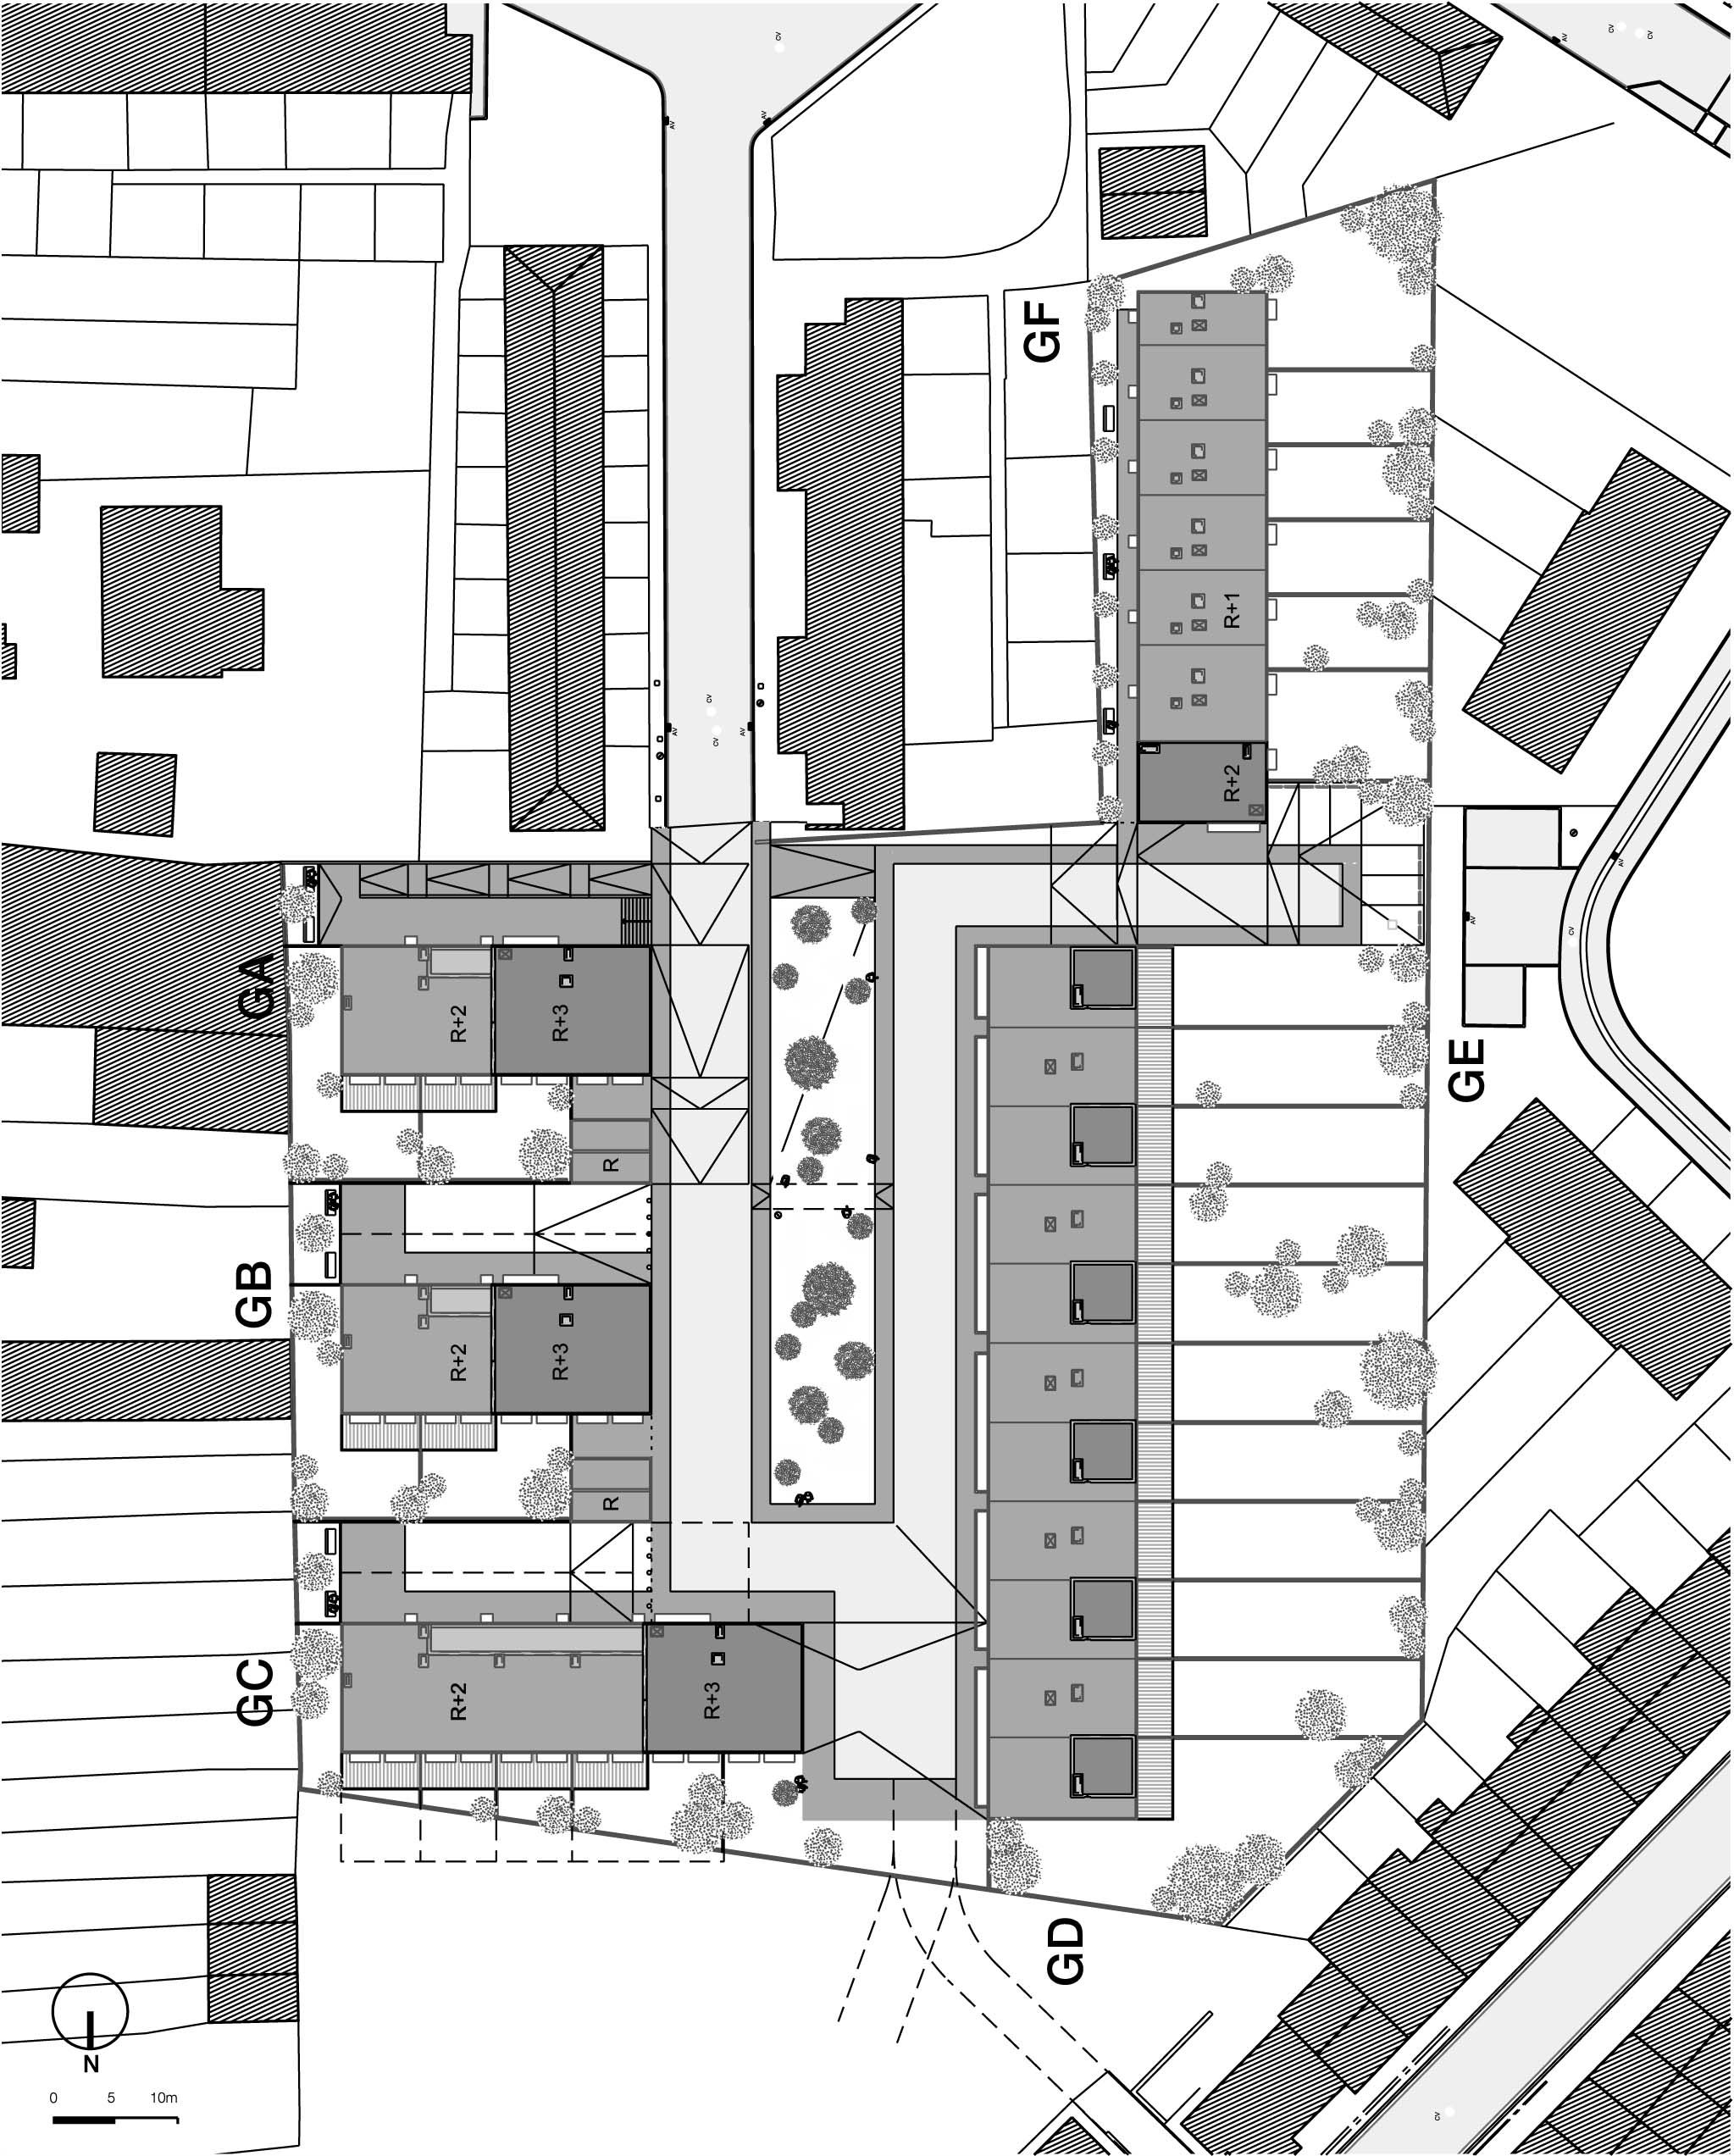 Sustainable Social Housing Project Sint Agatha Berchm B